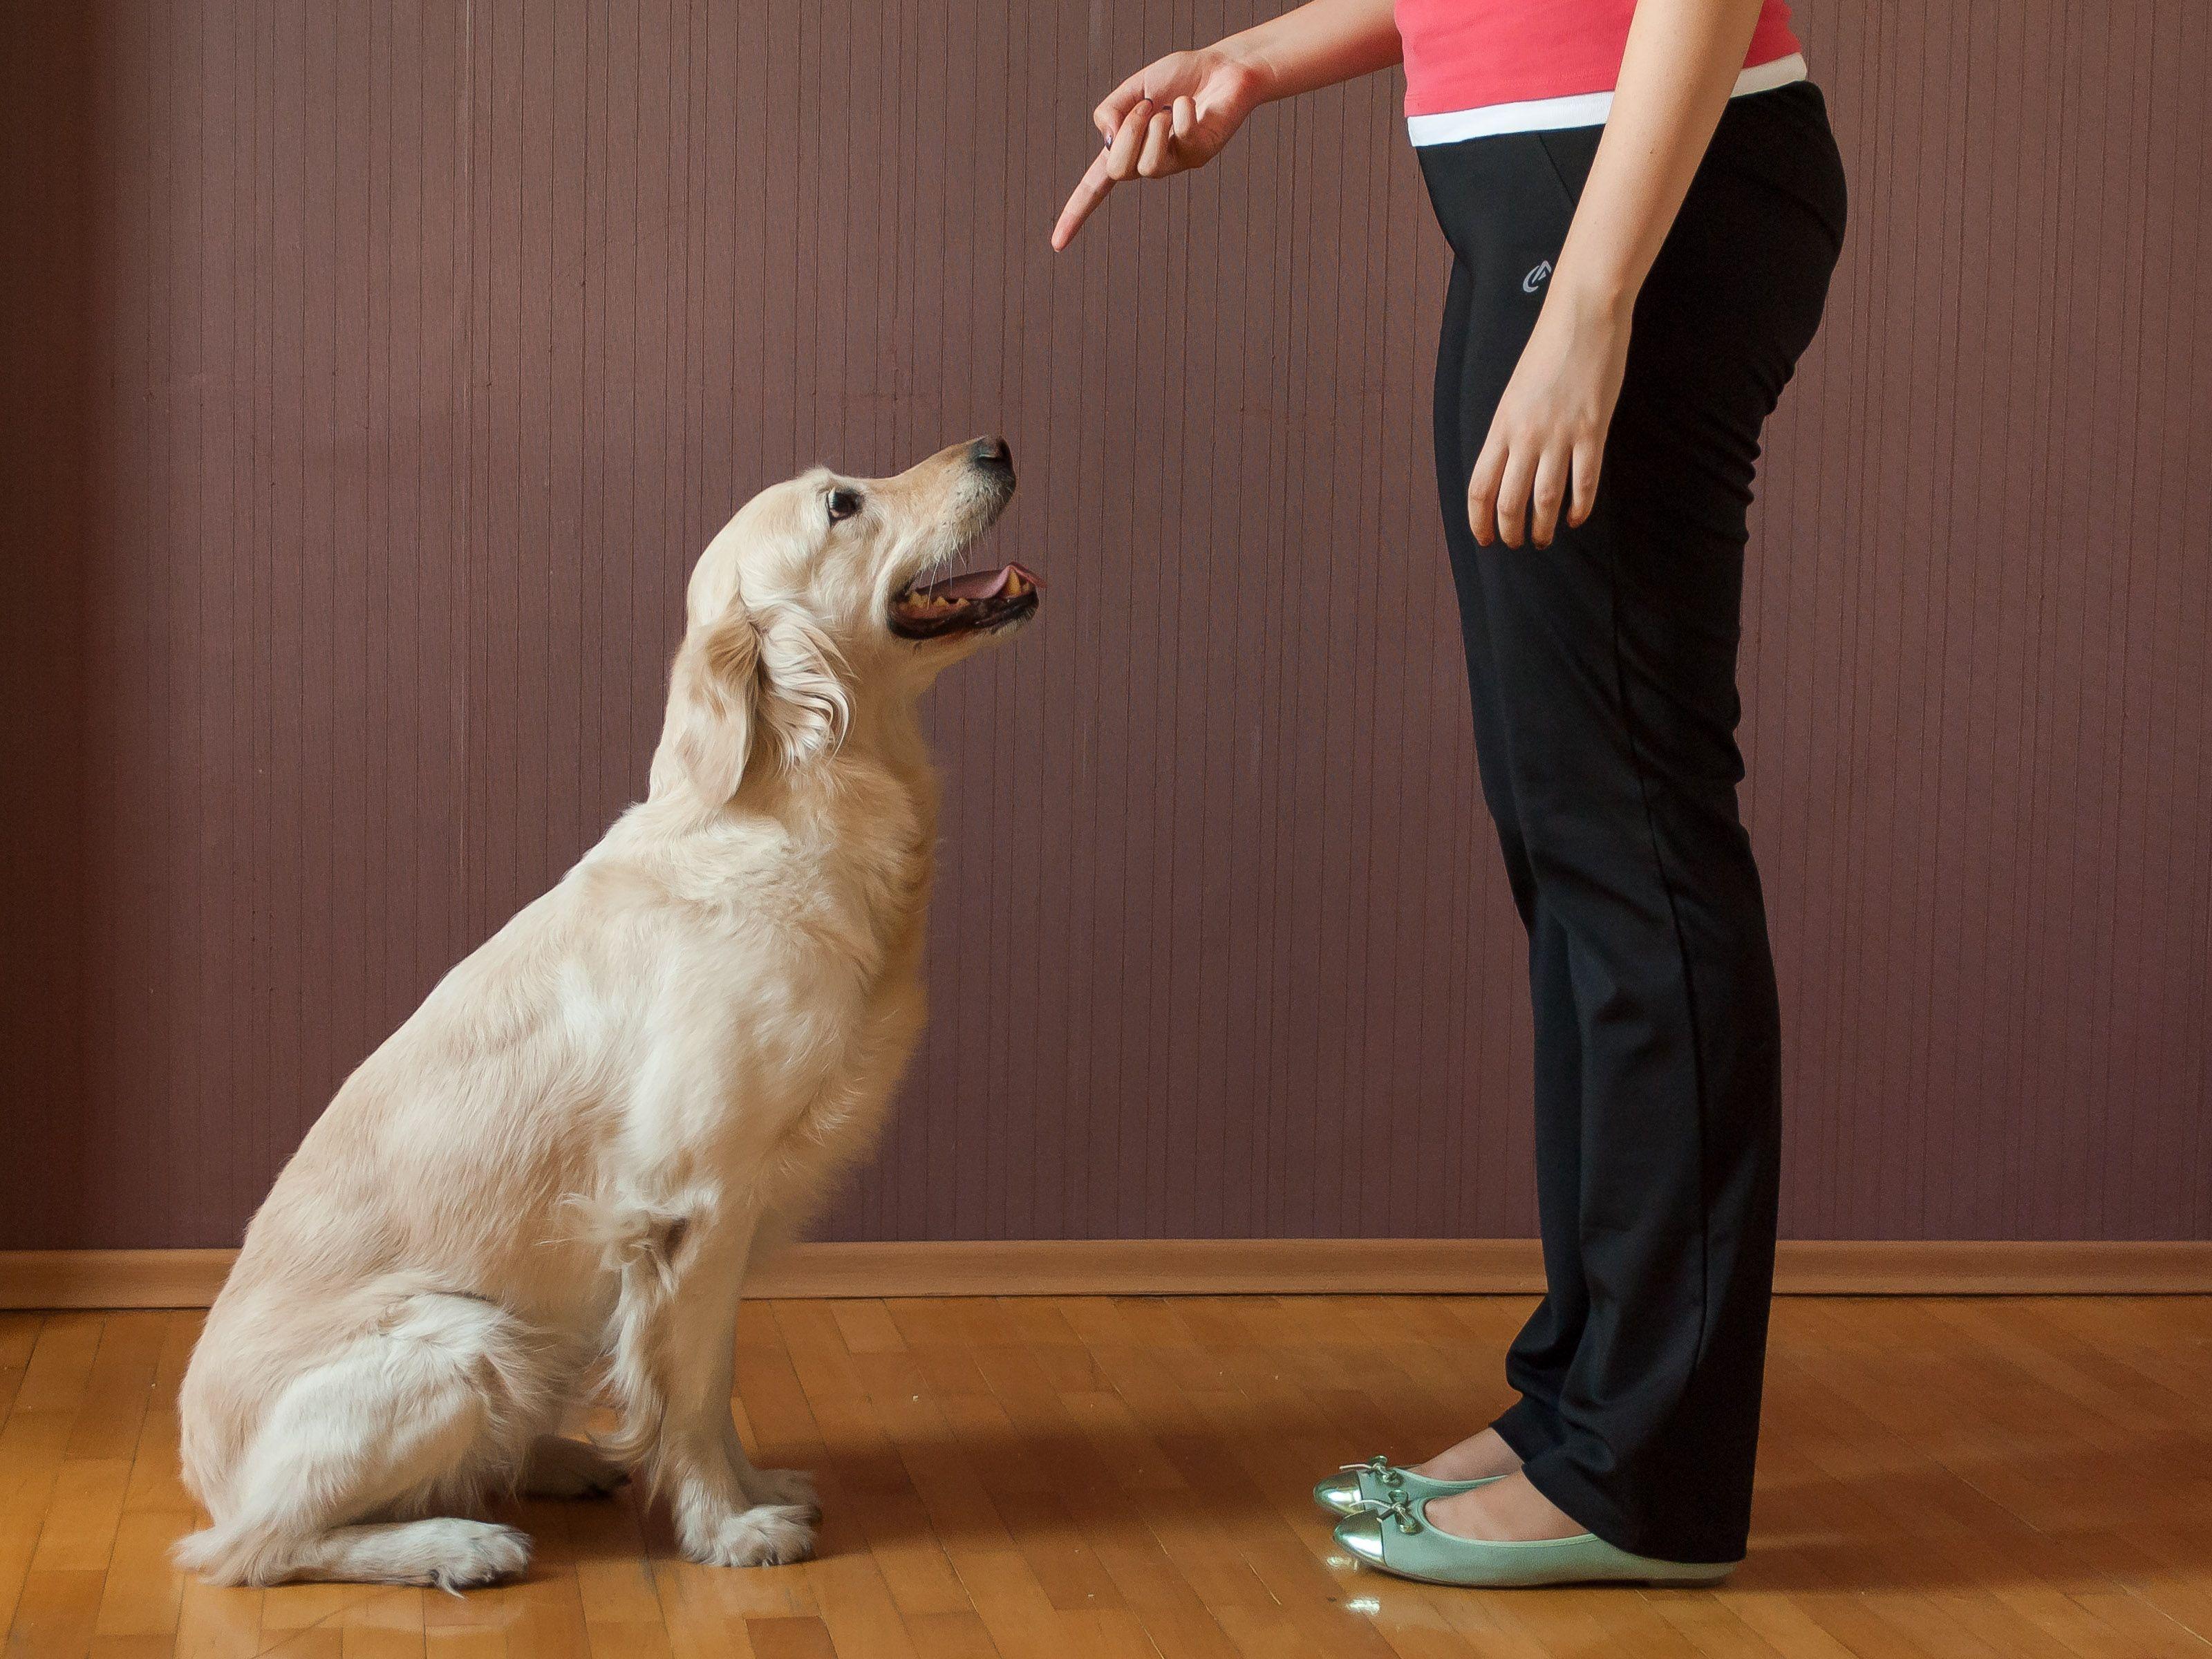 Teach Your Dog To Sit Dog Training Dog Training Books Dogs